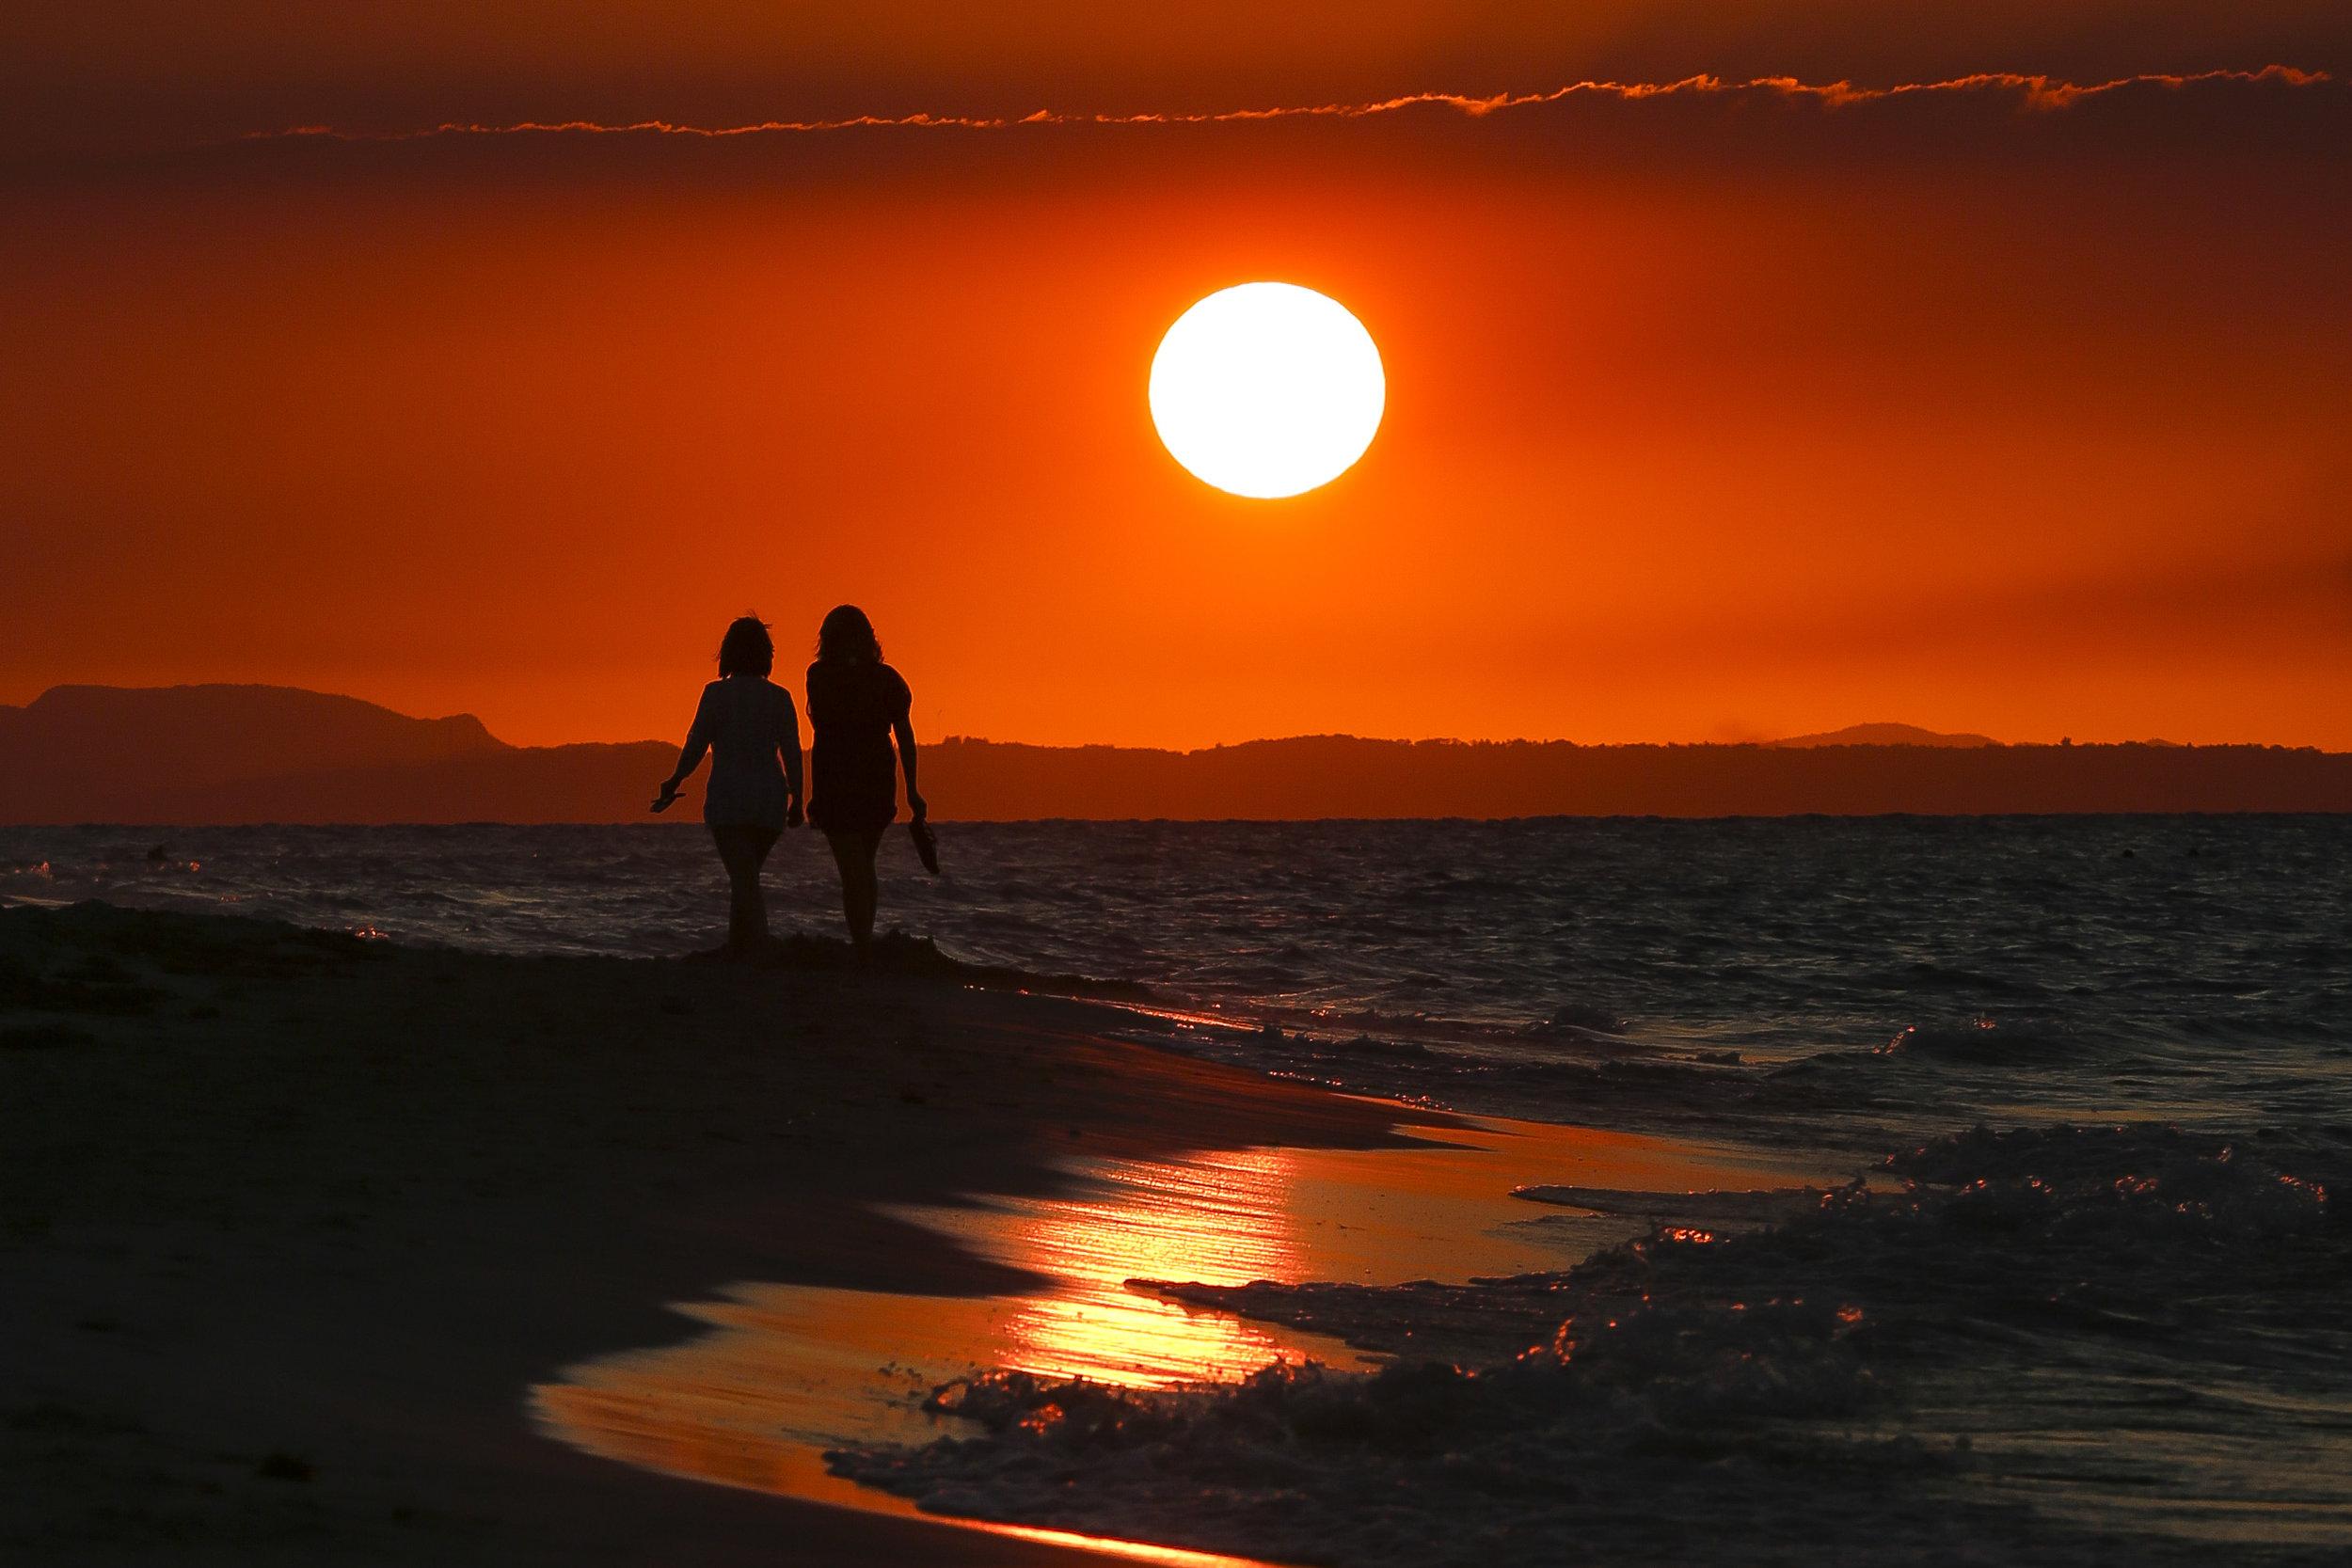 The sun sets in Varadero, Cuba on Tuesday, February, 14, 2017.